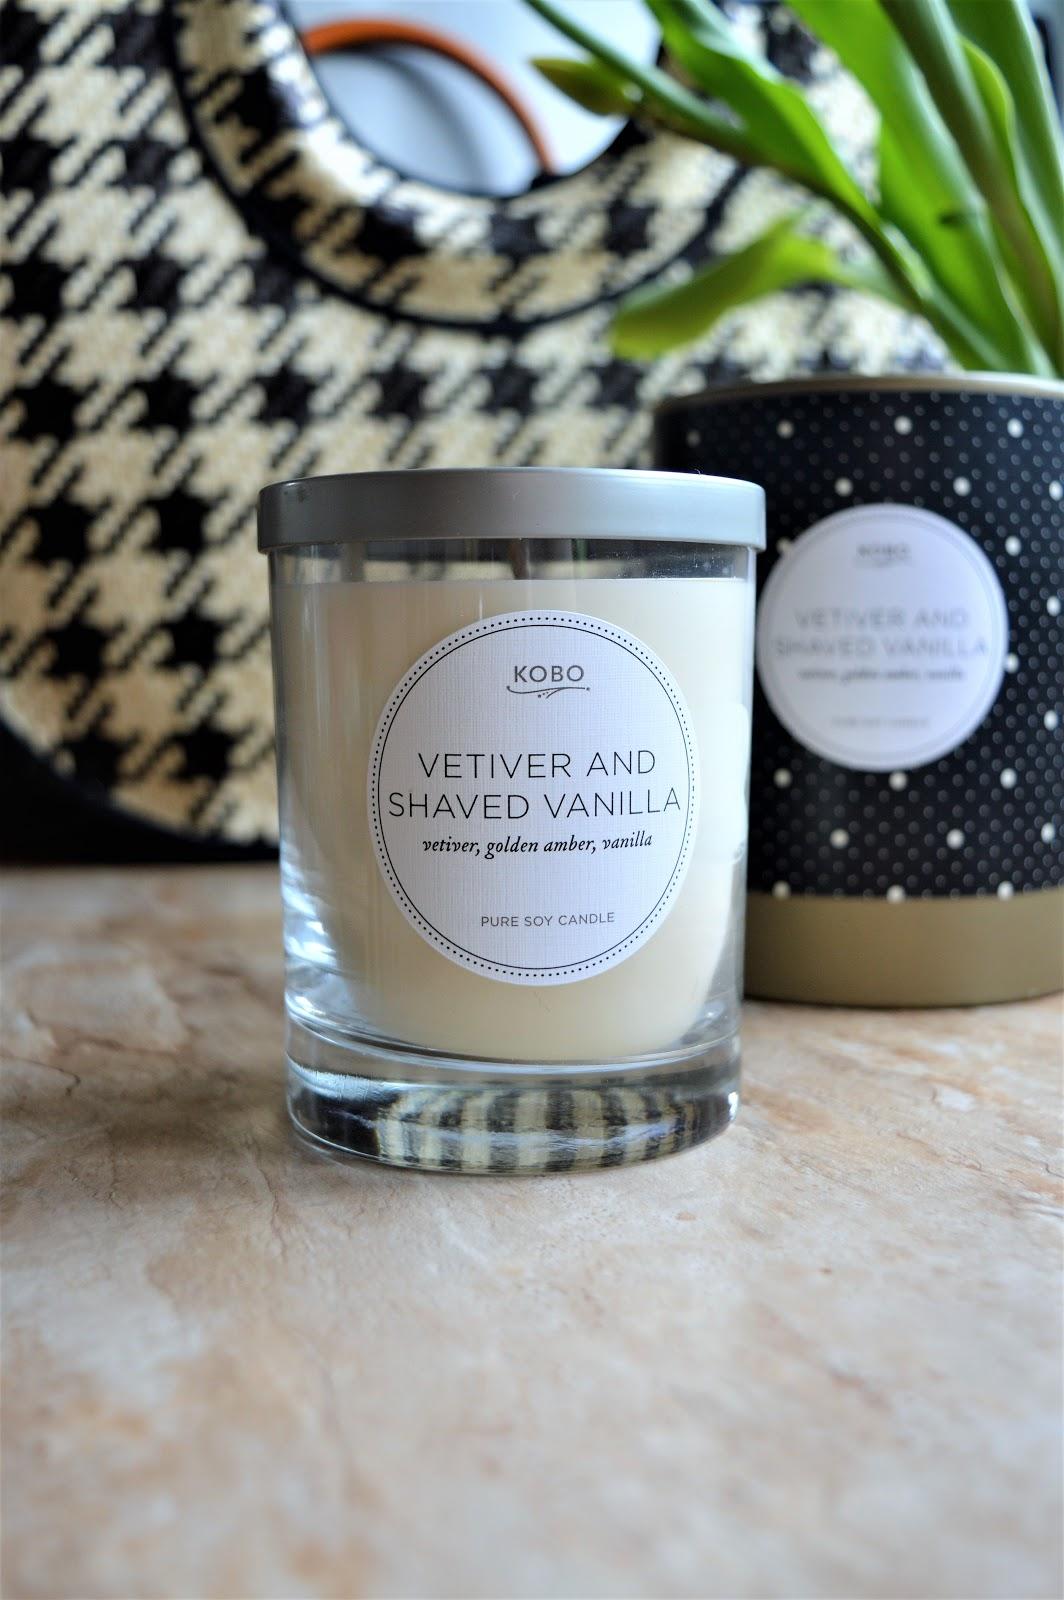 KOBO Świeca sojowa VETIVER AND SHAVED VANILLA, kobo świeca zapachowa, świeca sojowa, świece zapachowe blog, kobo candles